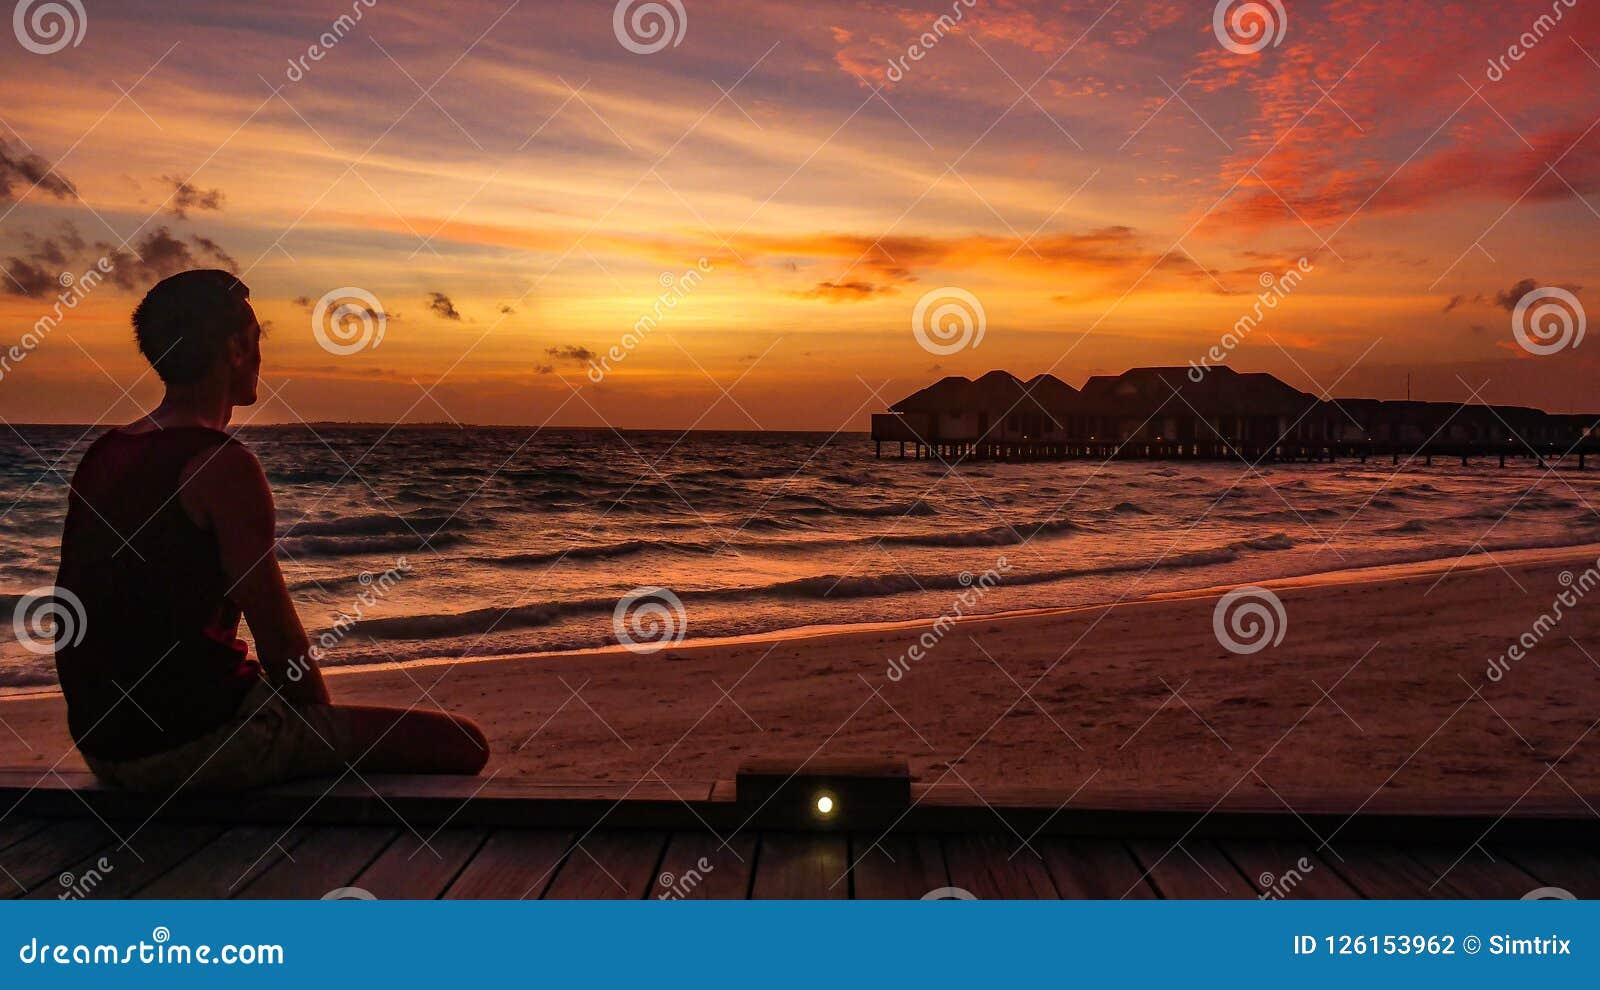 Man watching Beautiful Sunset over the Indian ocean on Maldives Resort Island.